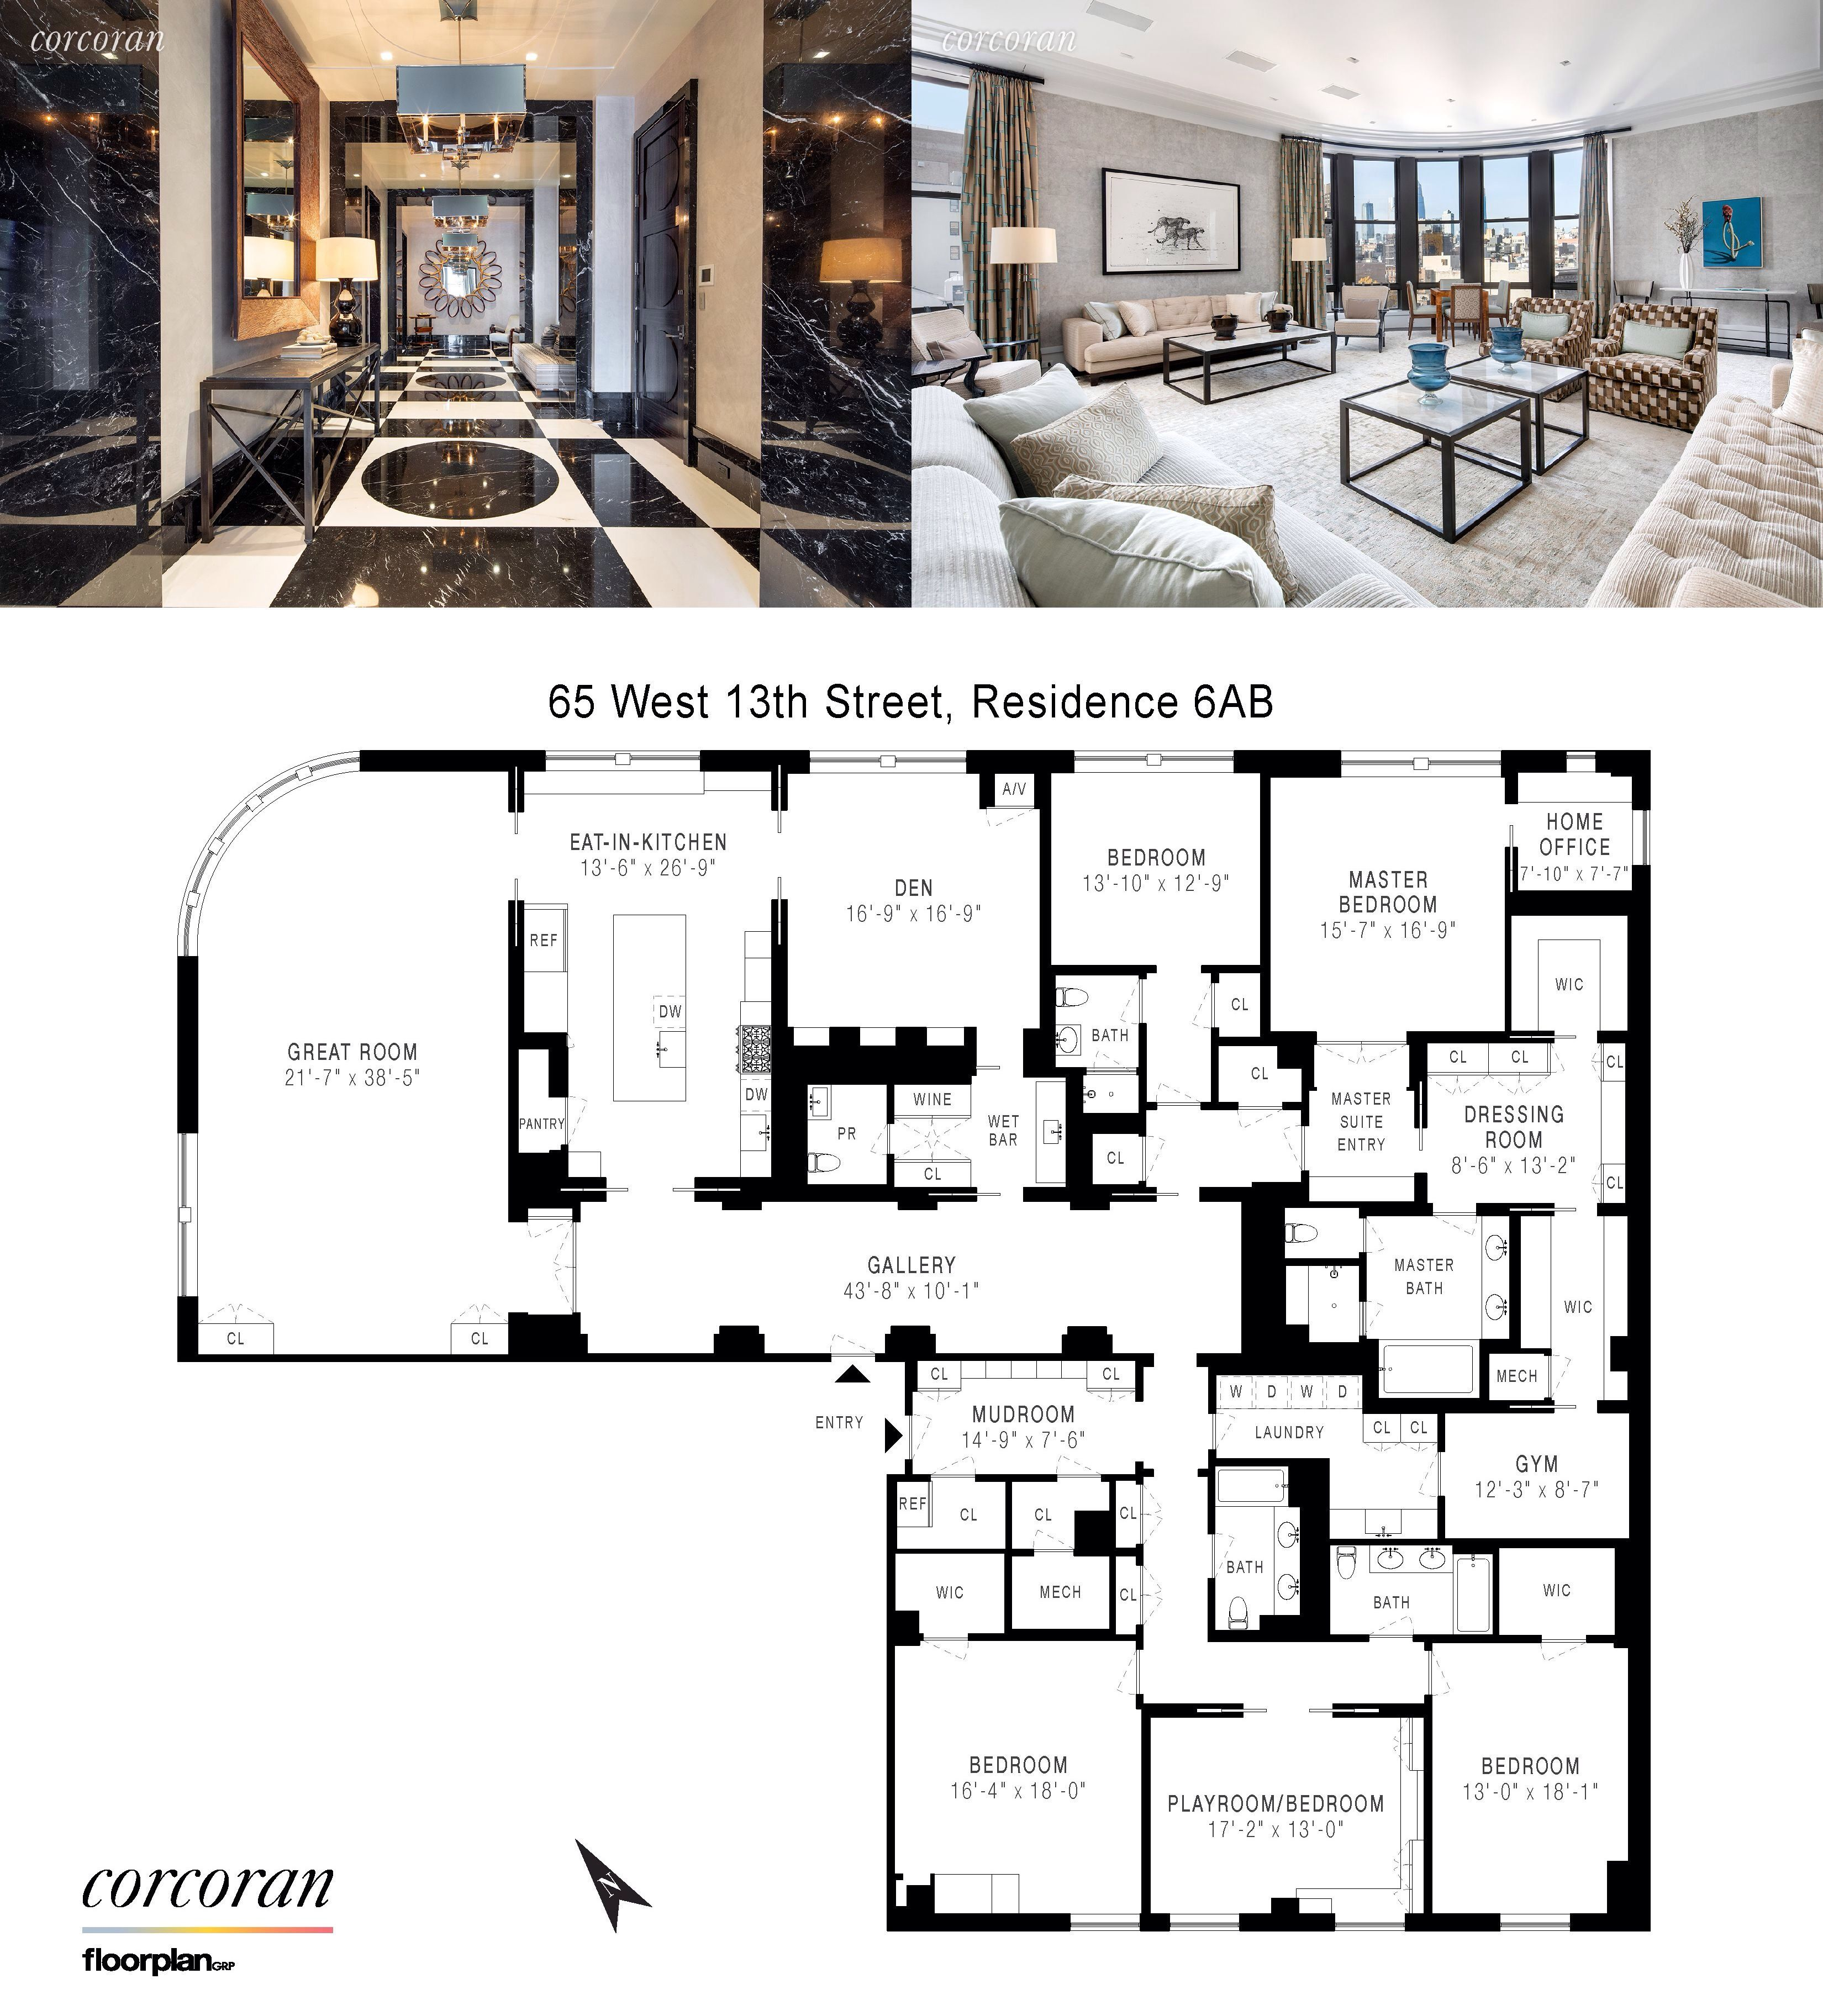 65 West 13th Street Apt 6ab Between Fifth Avenue And Sixth Avenue Condo Greenwich Village Condo Floor Plans Apartment Floor Plans Mansion Plans